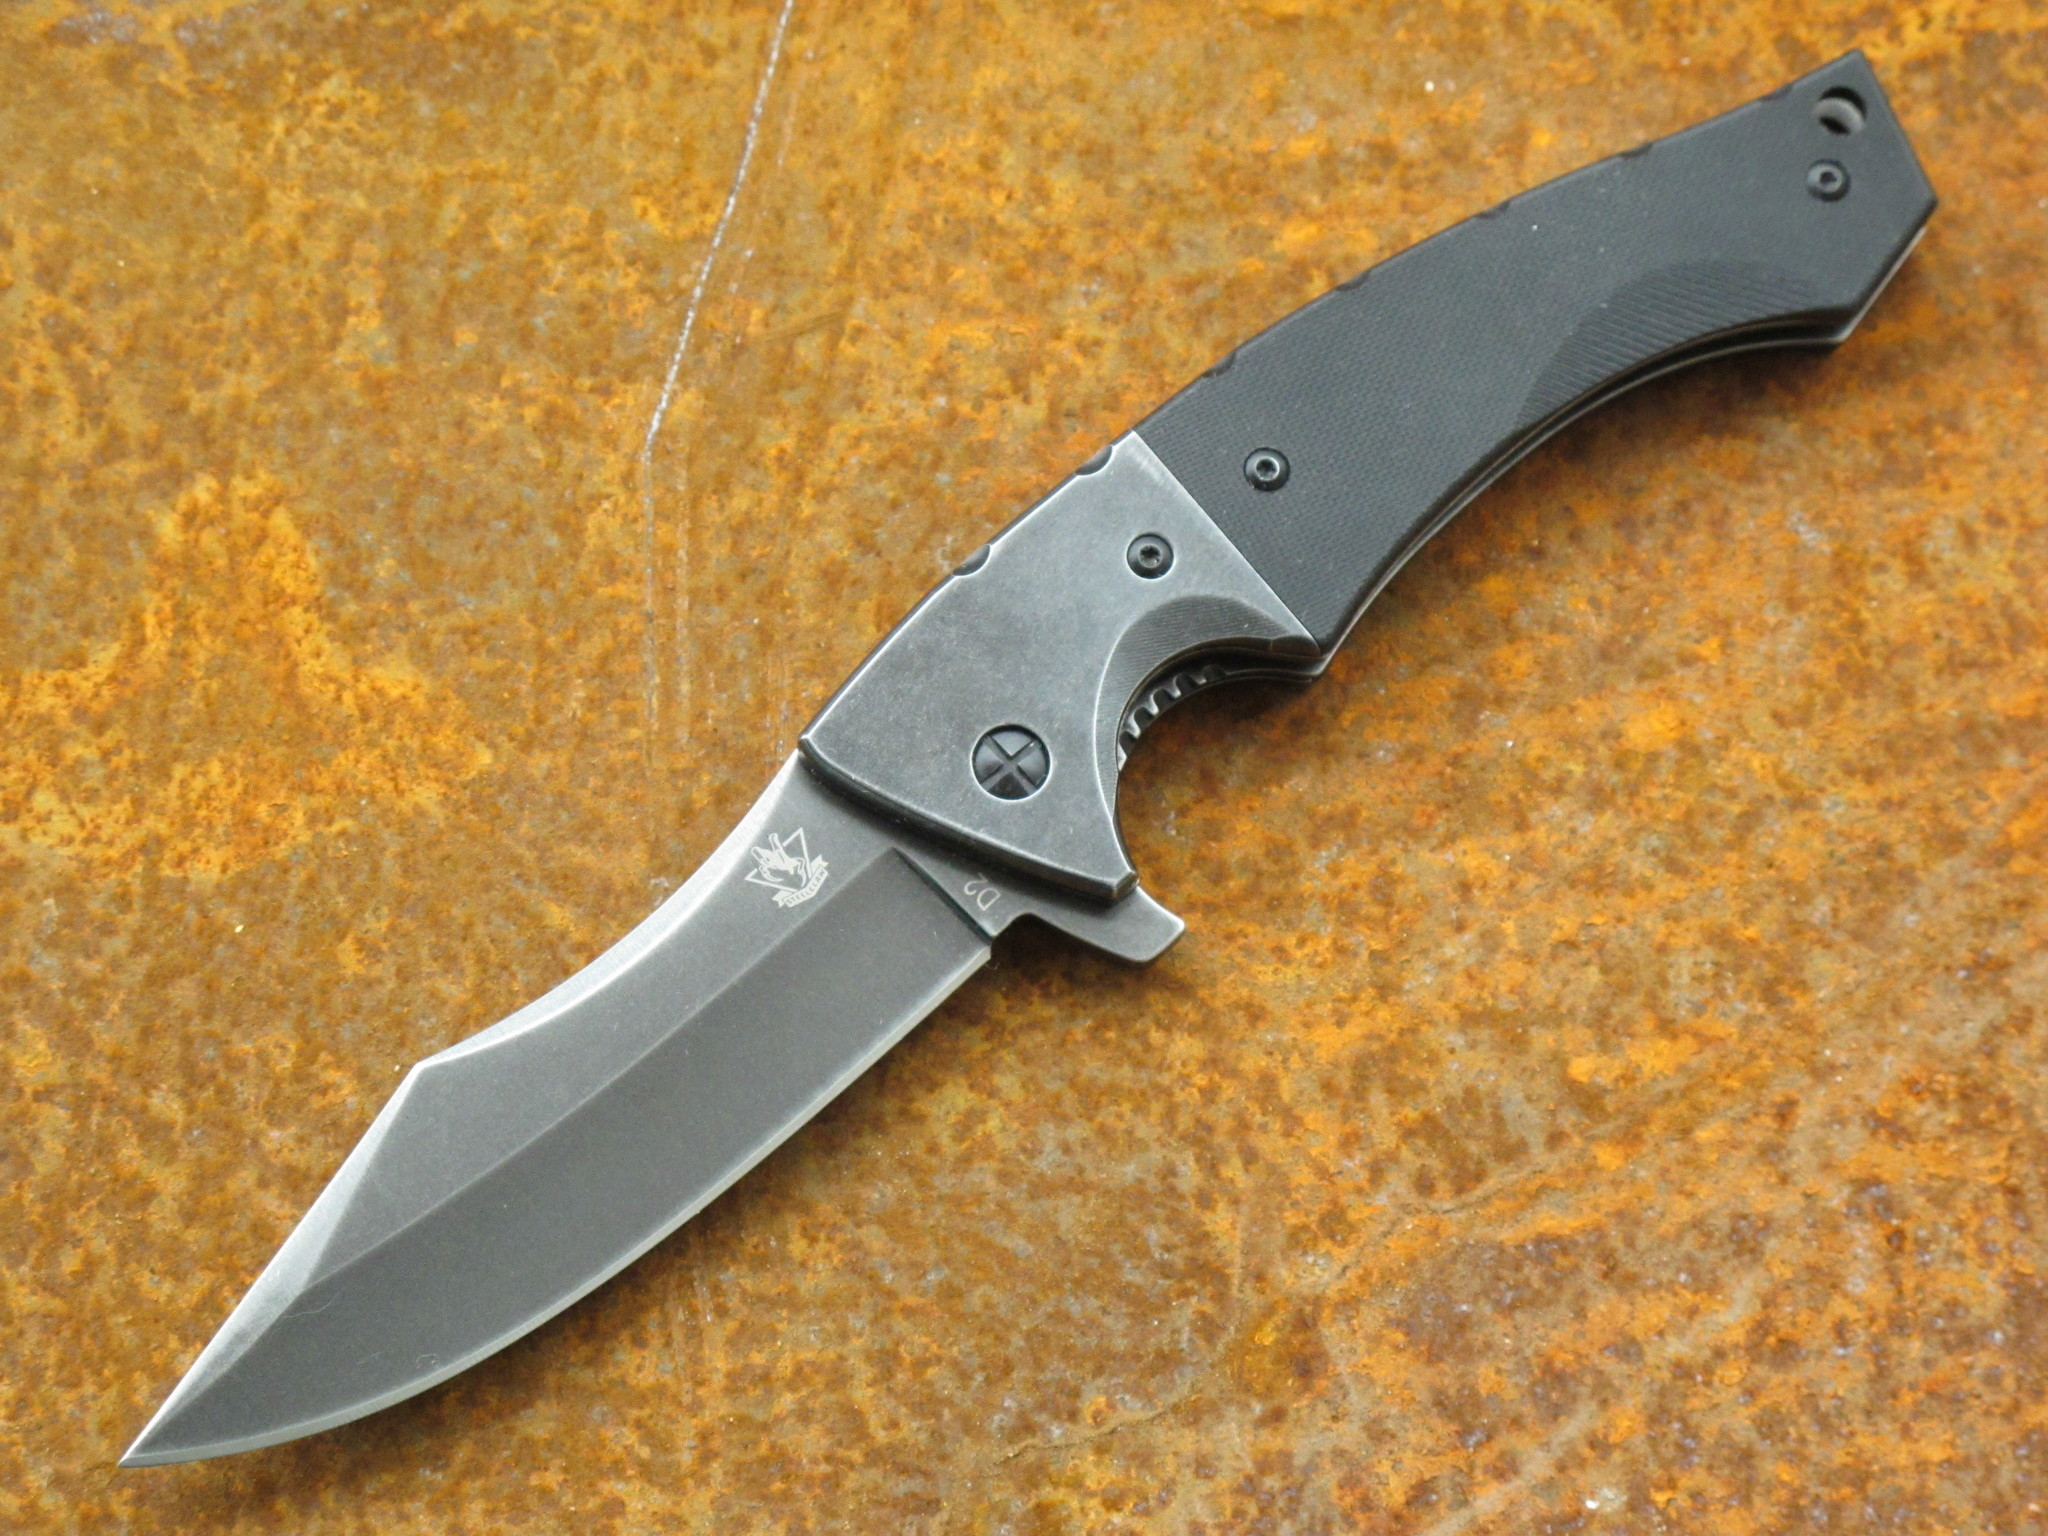 Складной нож Steelclaw Змей